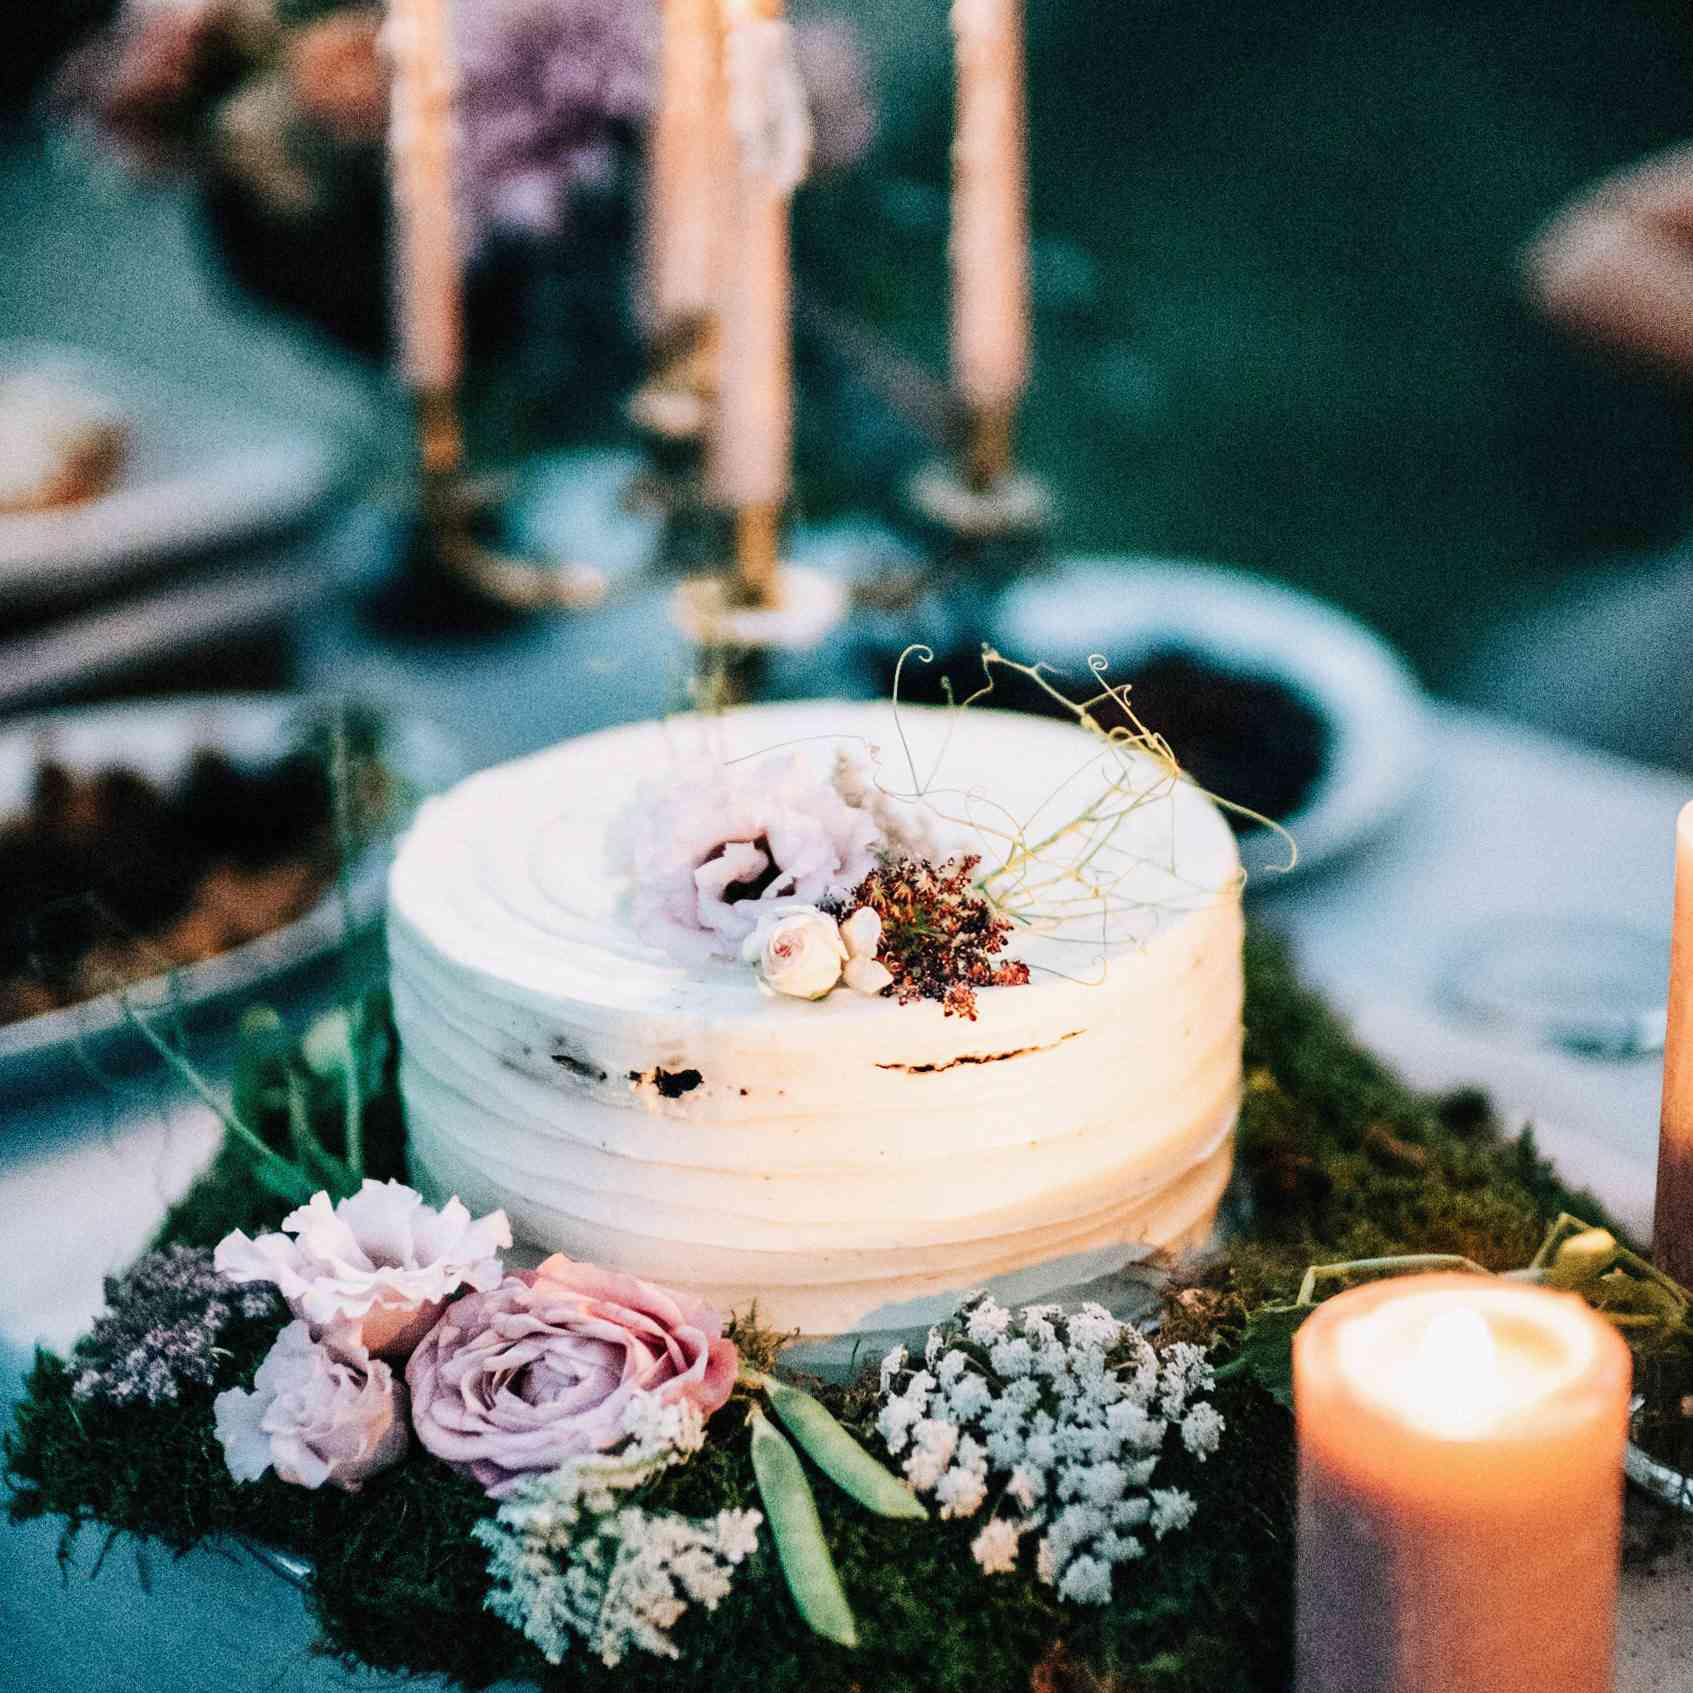 A simple wedding cake on a wreath